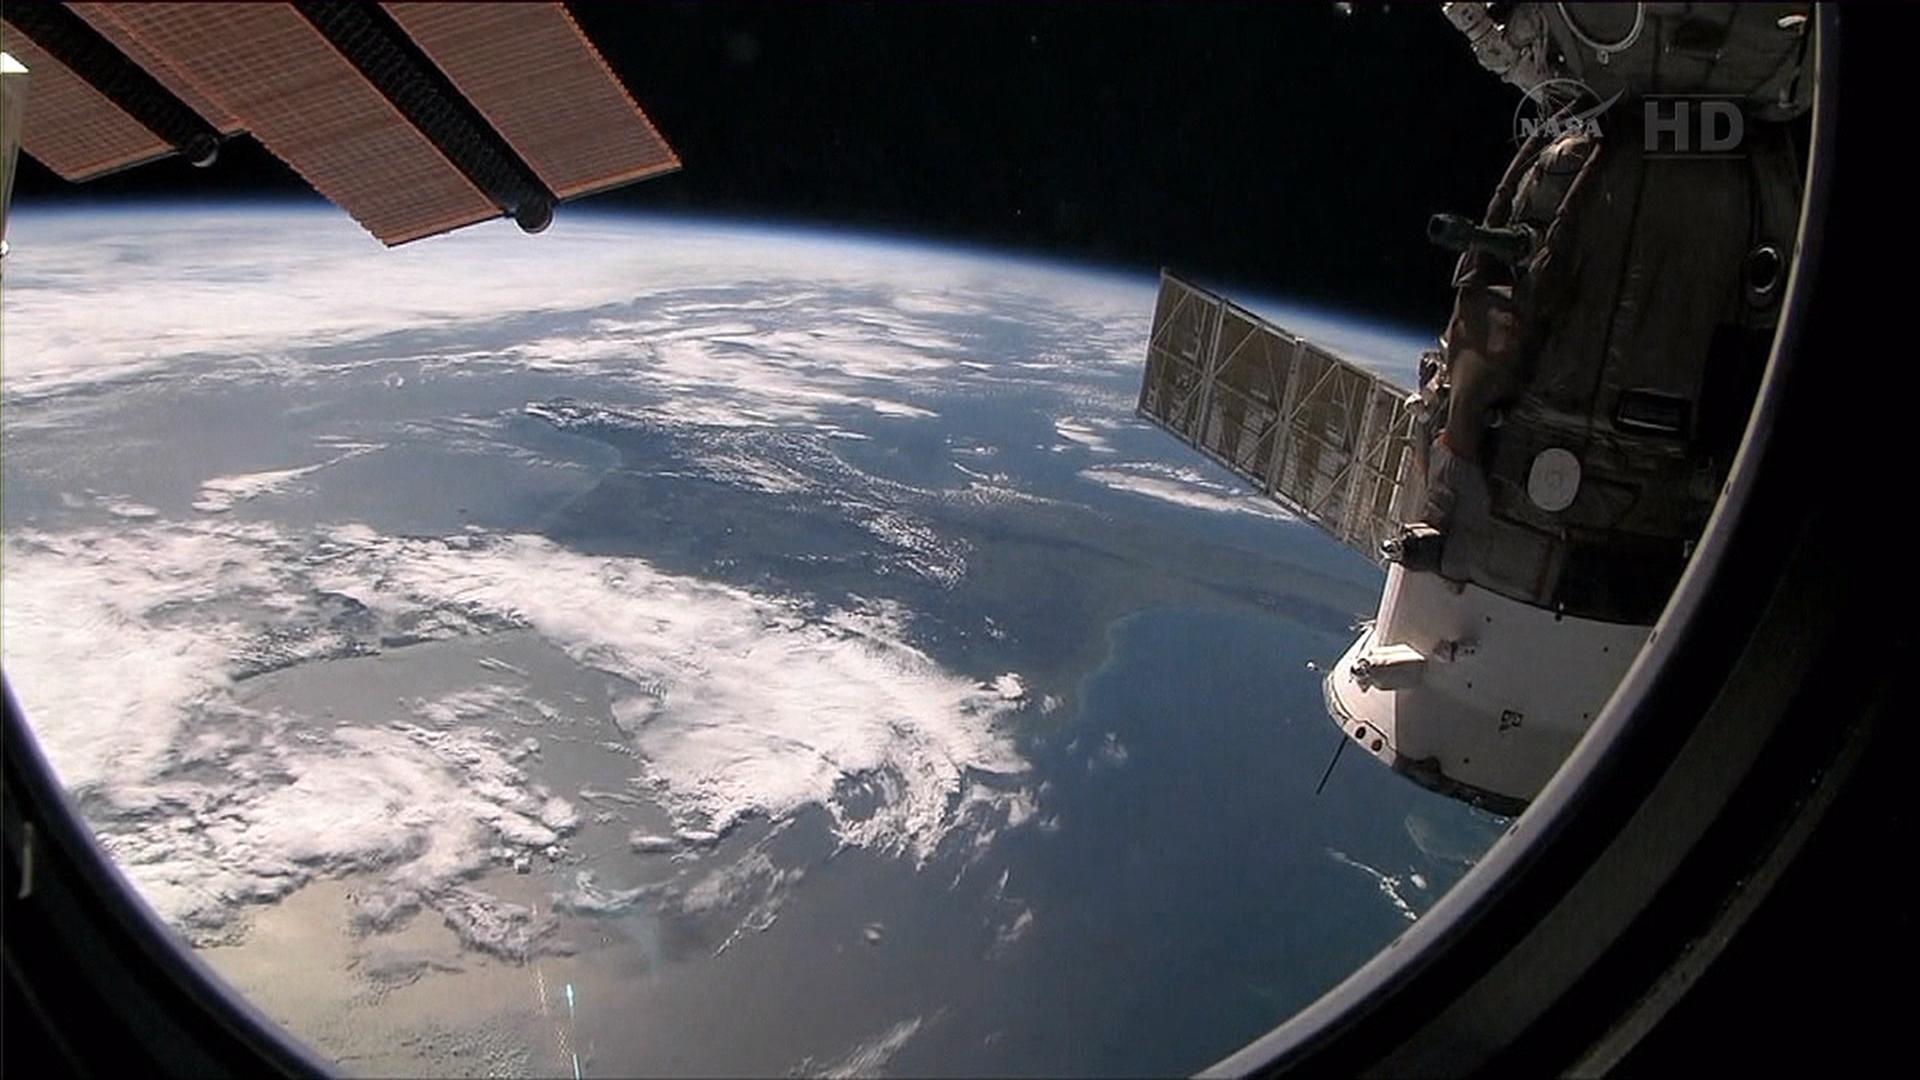 space station ammonia leak - photo #20